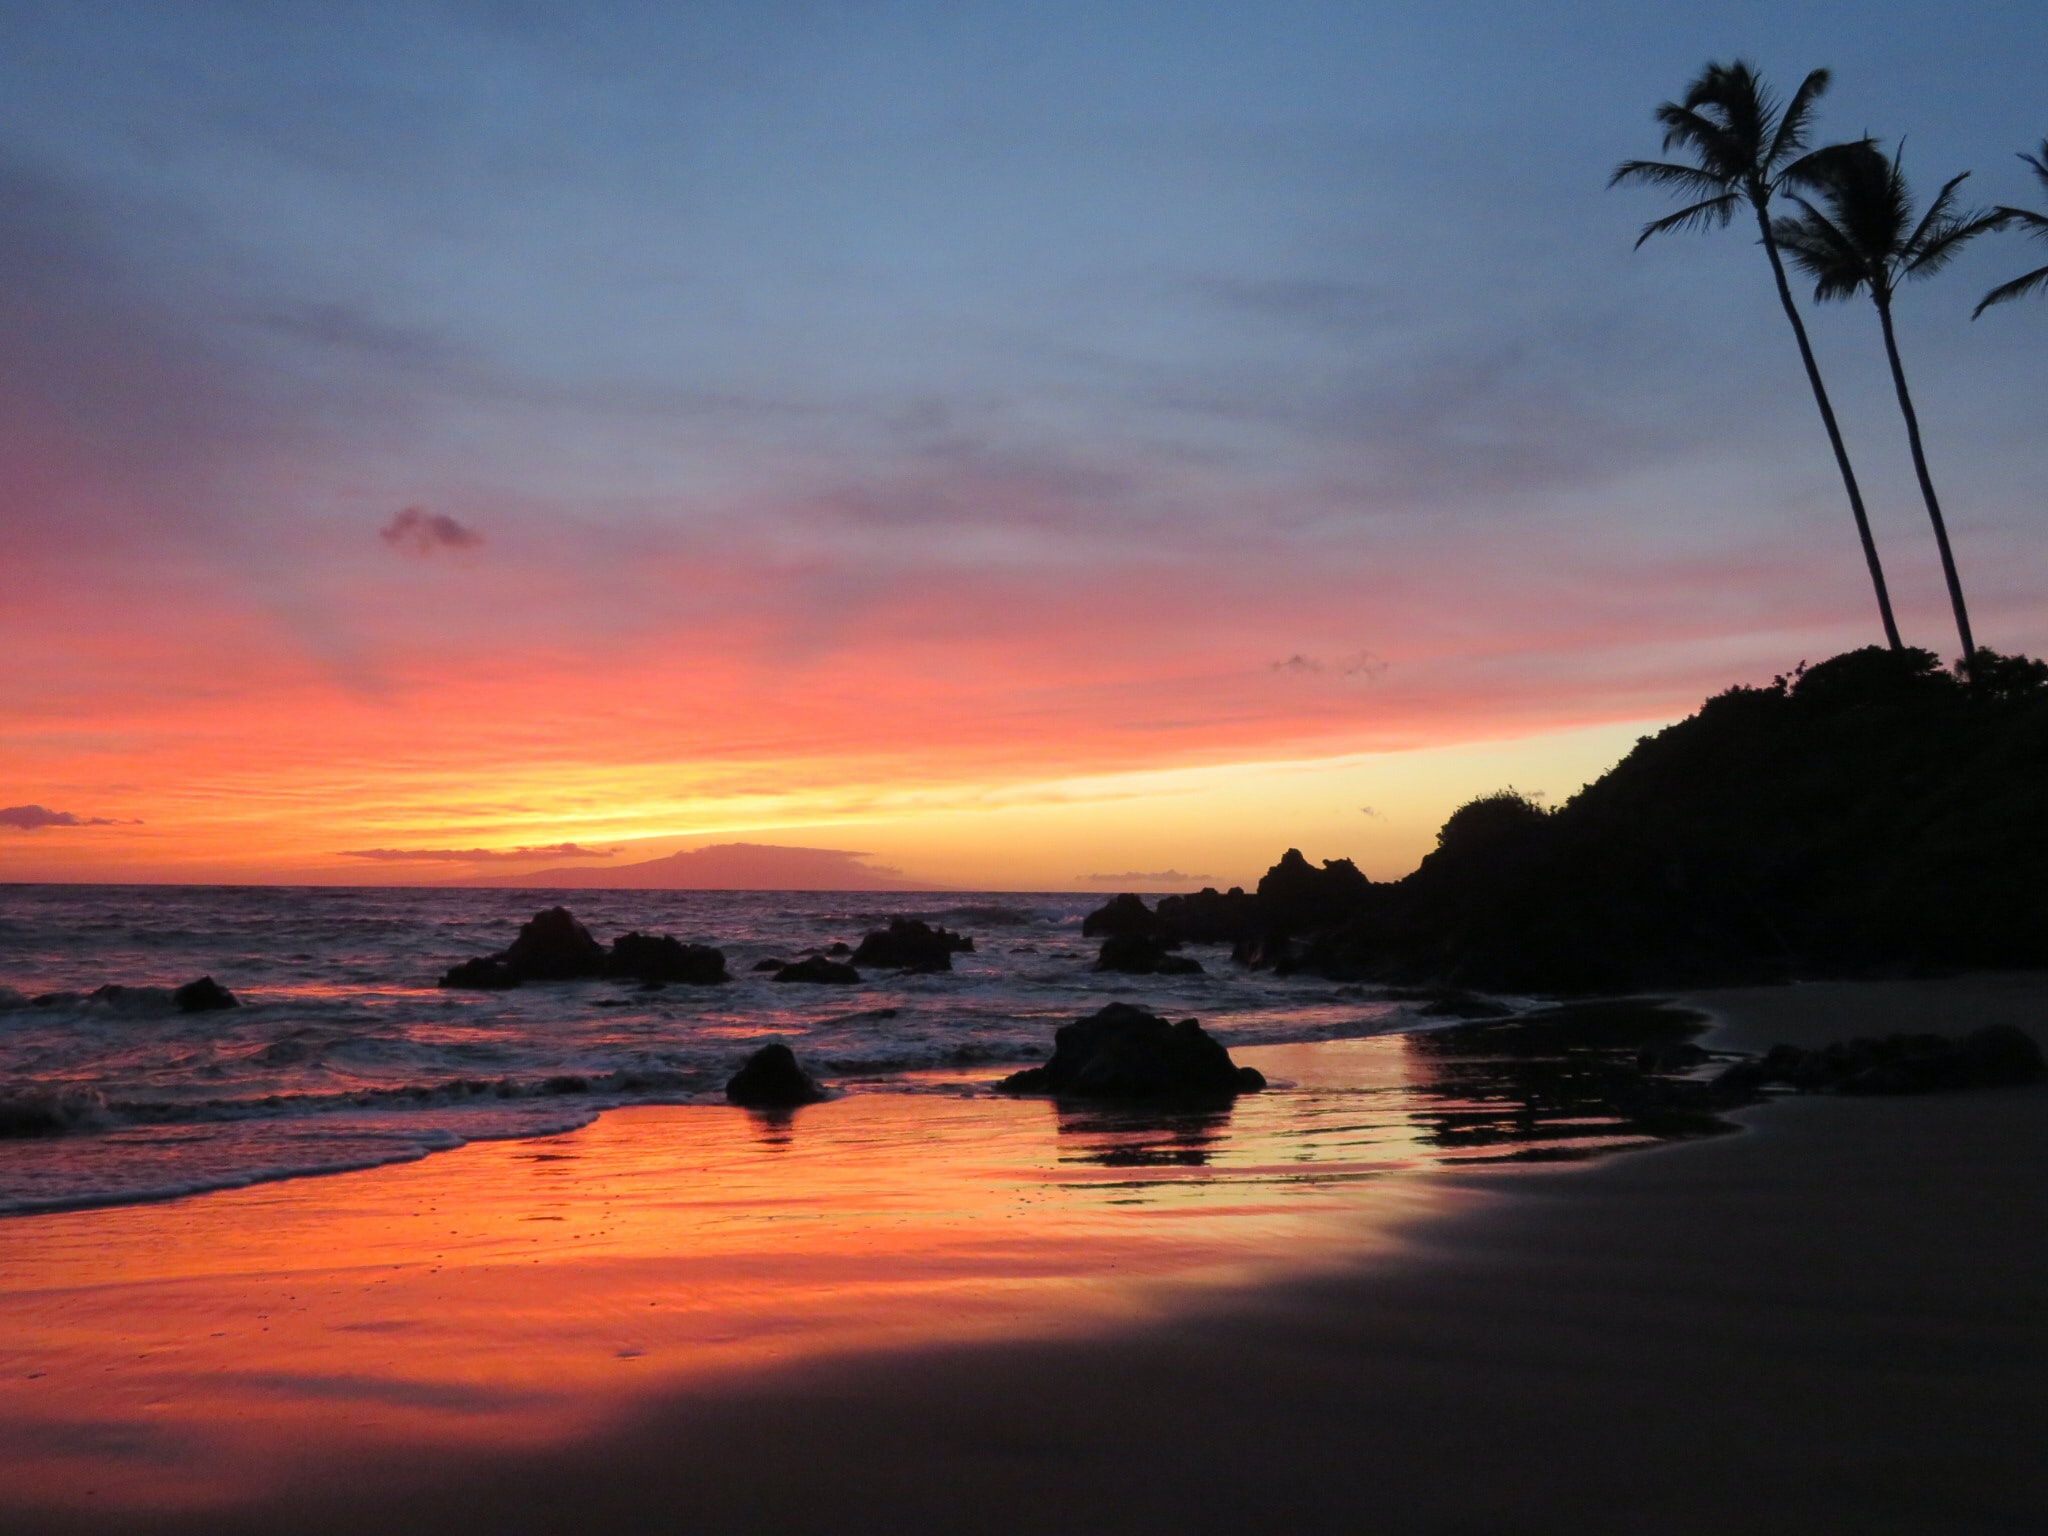 seashore under sunset